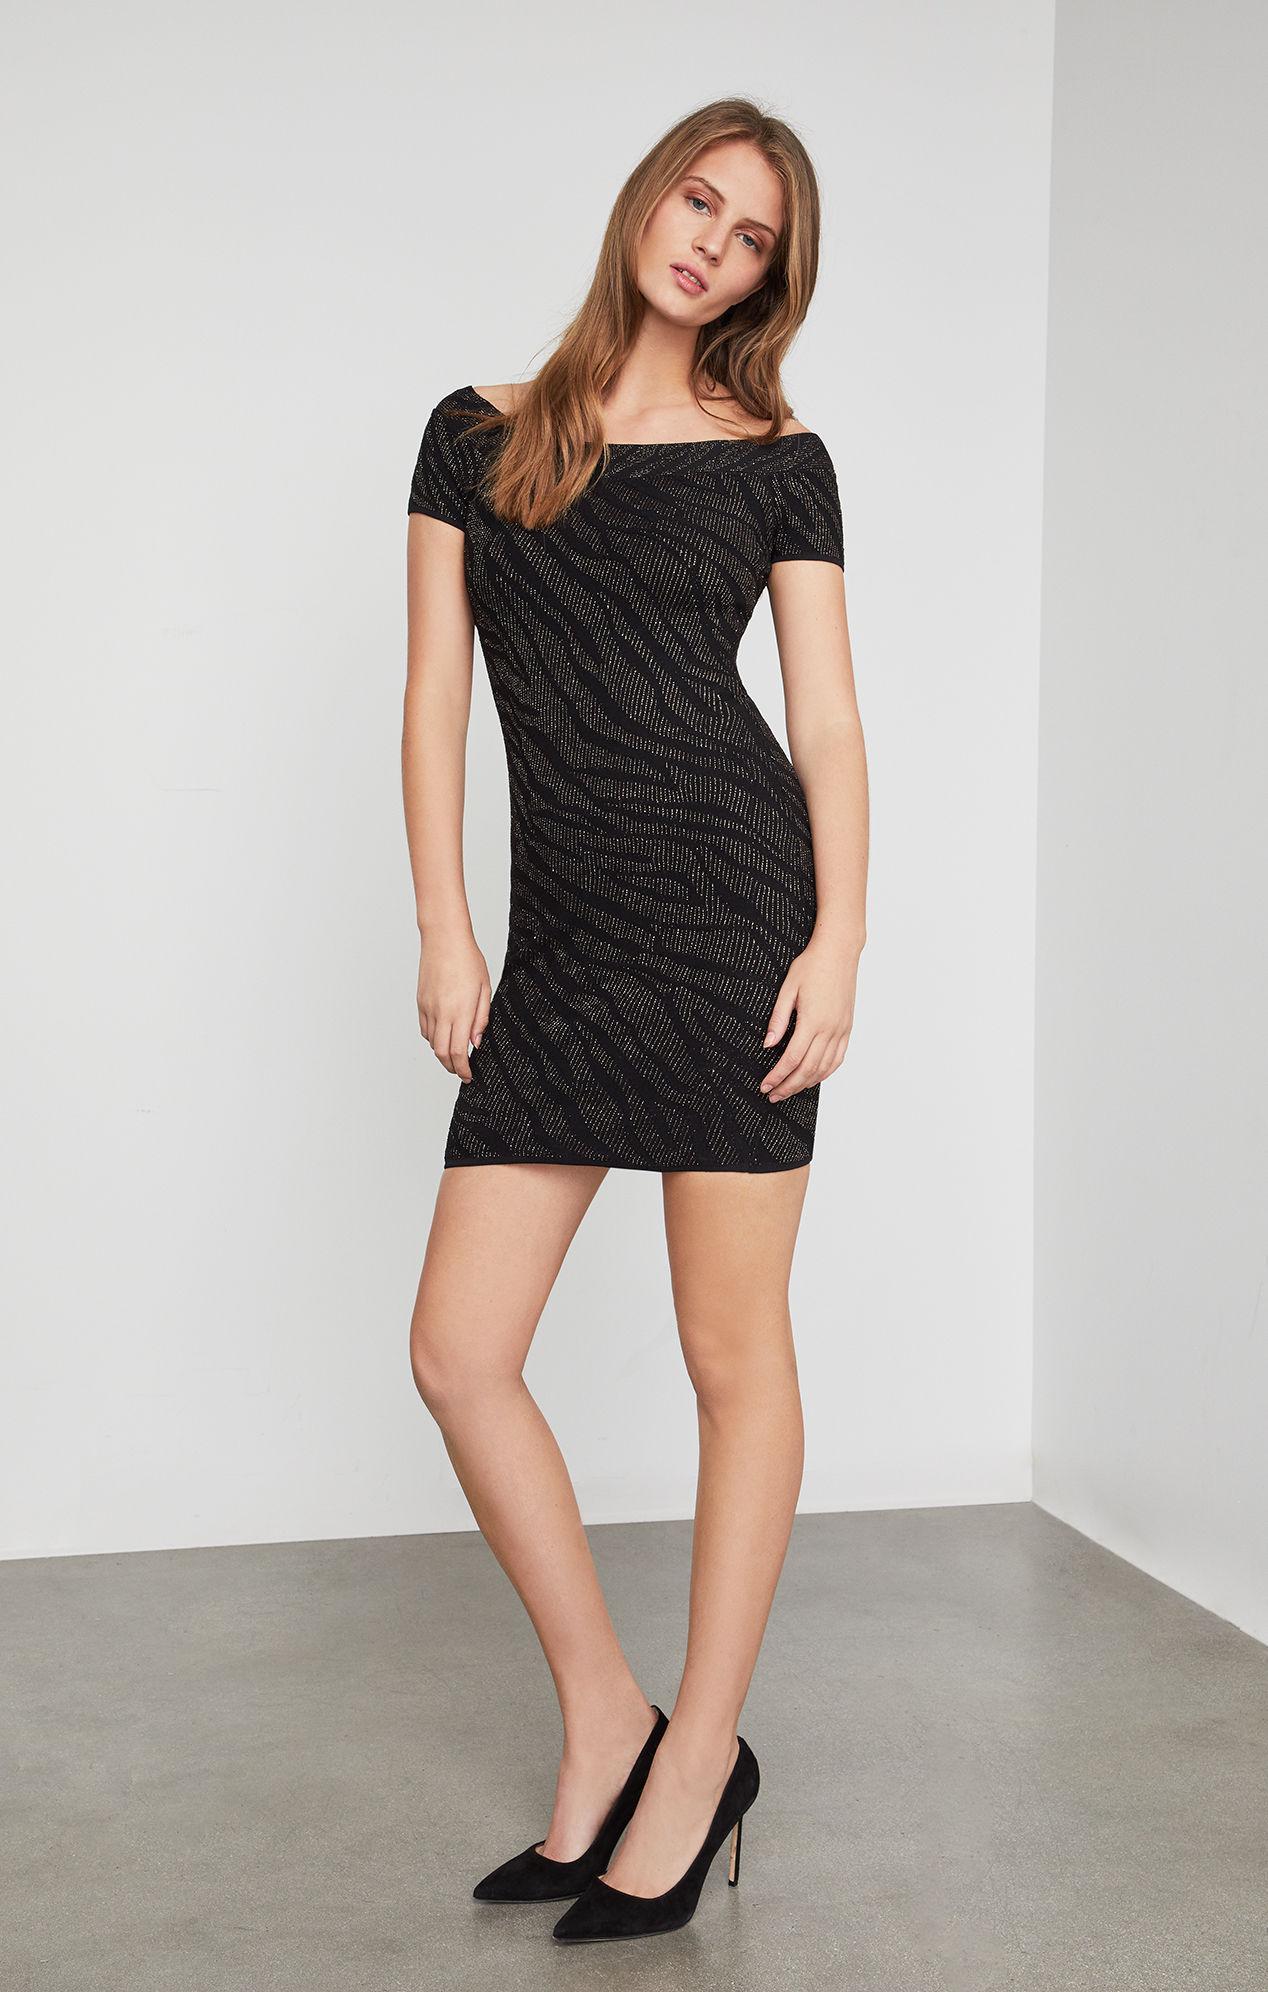 c3bcf78550 Lyst - BCBGMAXAZRIA Bcbg Metallic Tiger Print Dress in Black